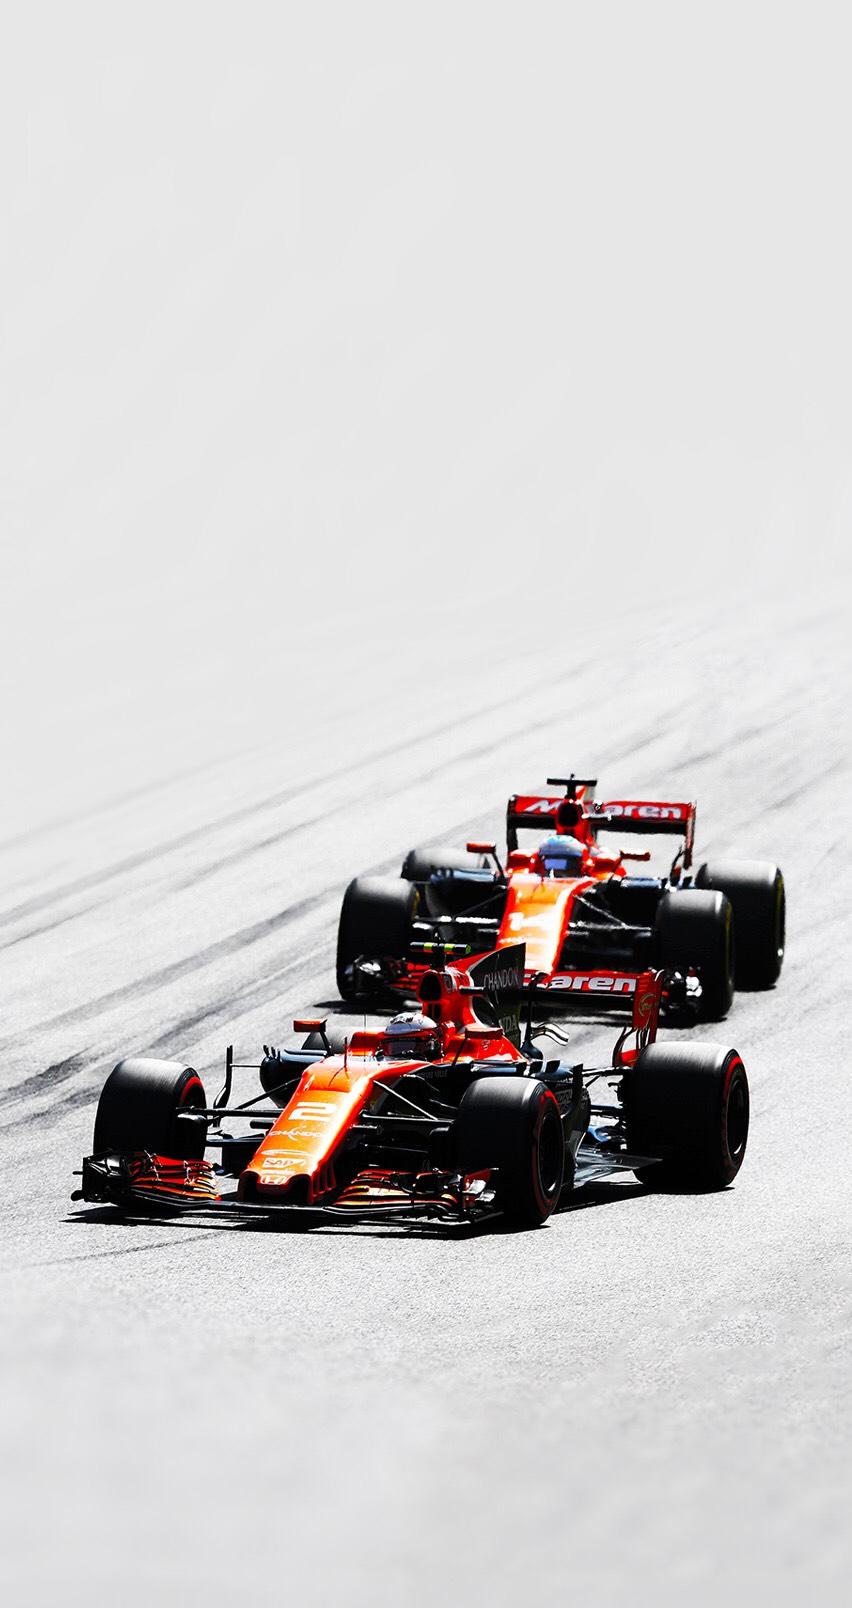 McLaren Honda F1 phone wallpaper 852x1608